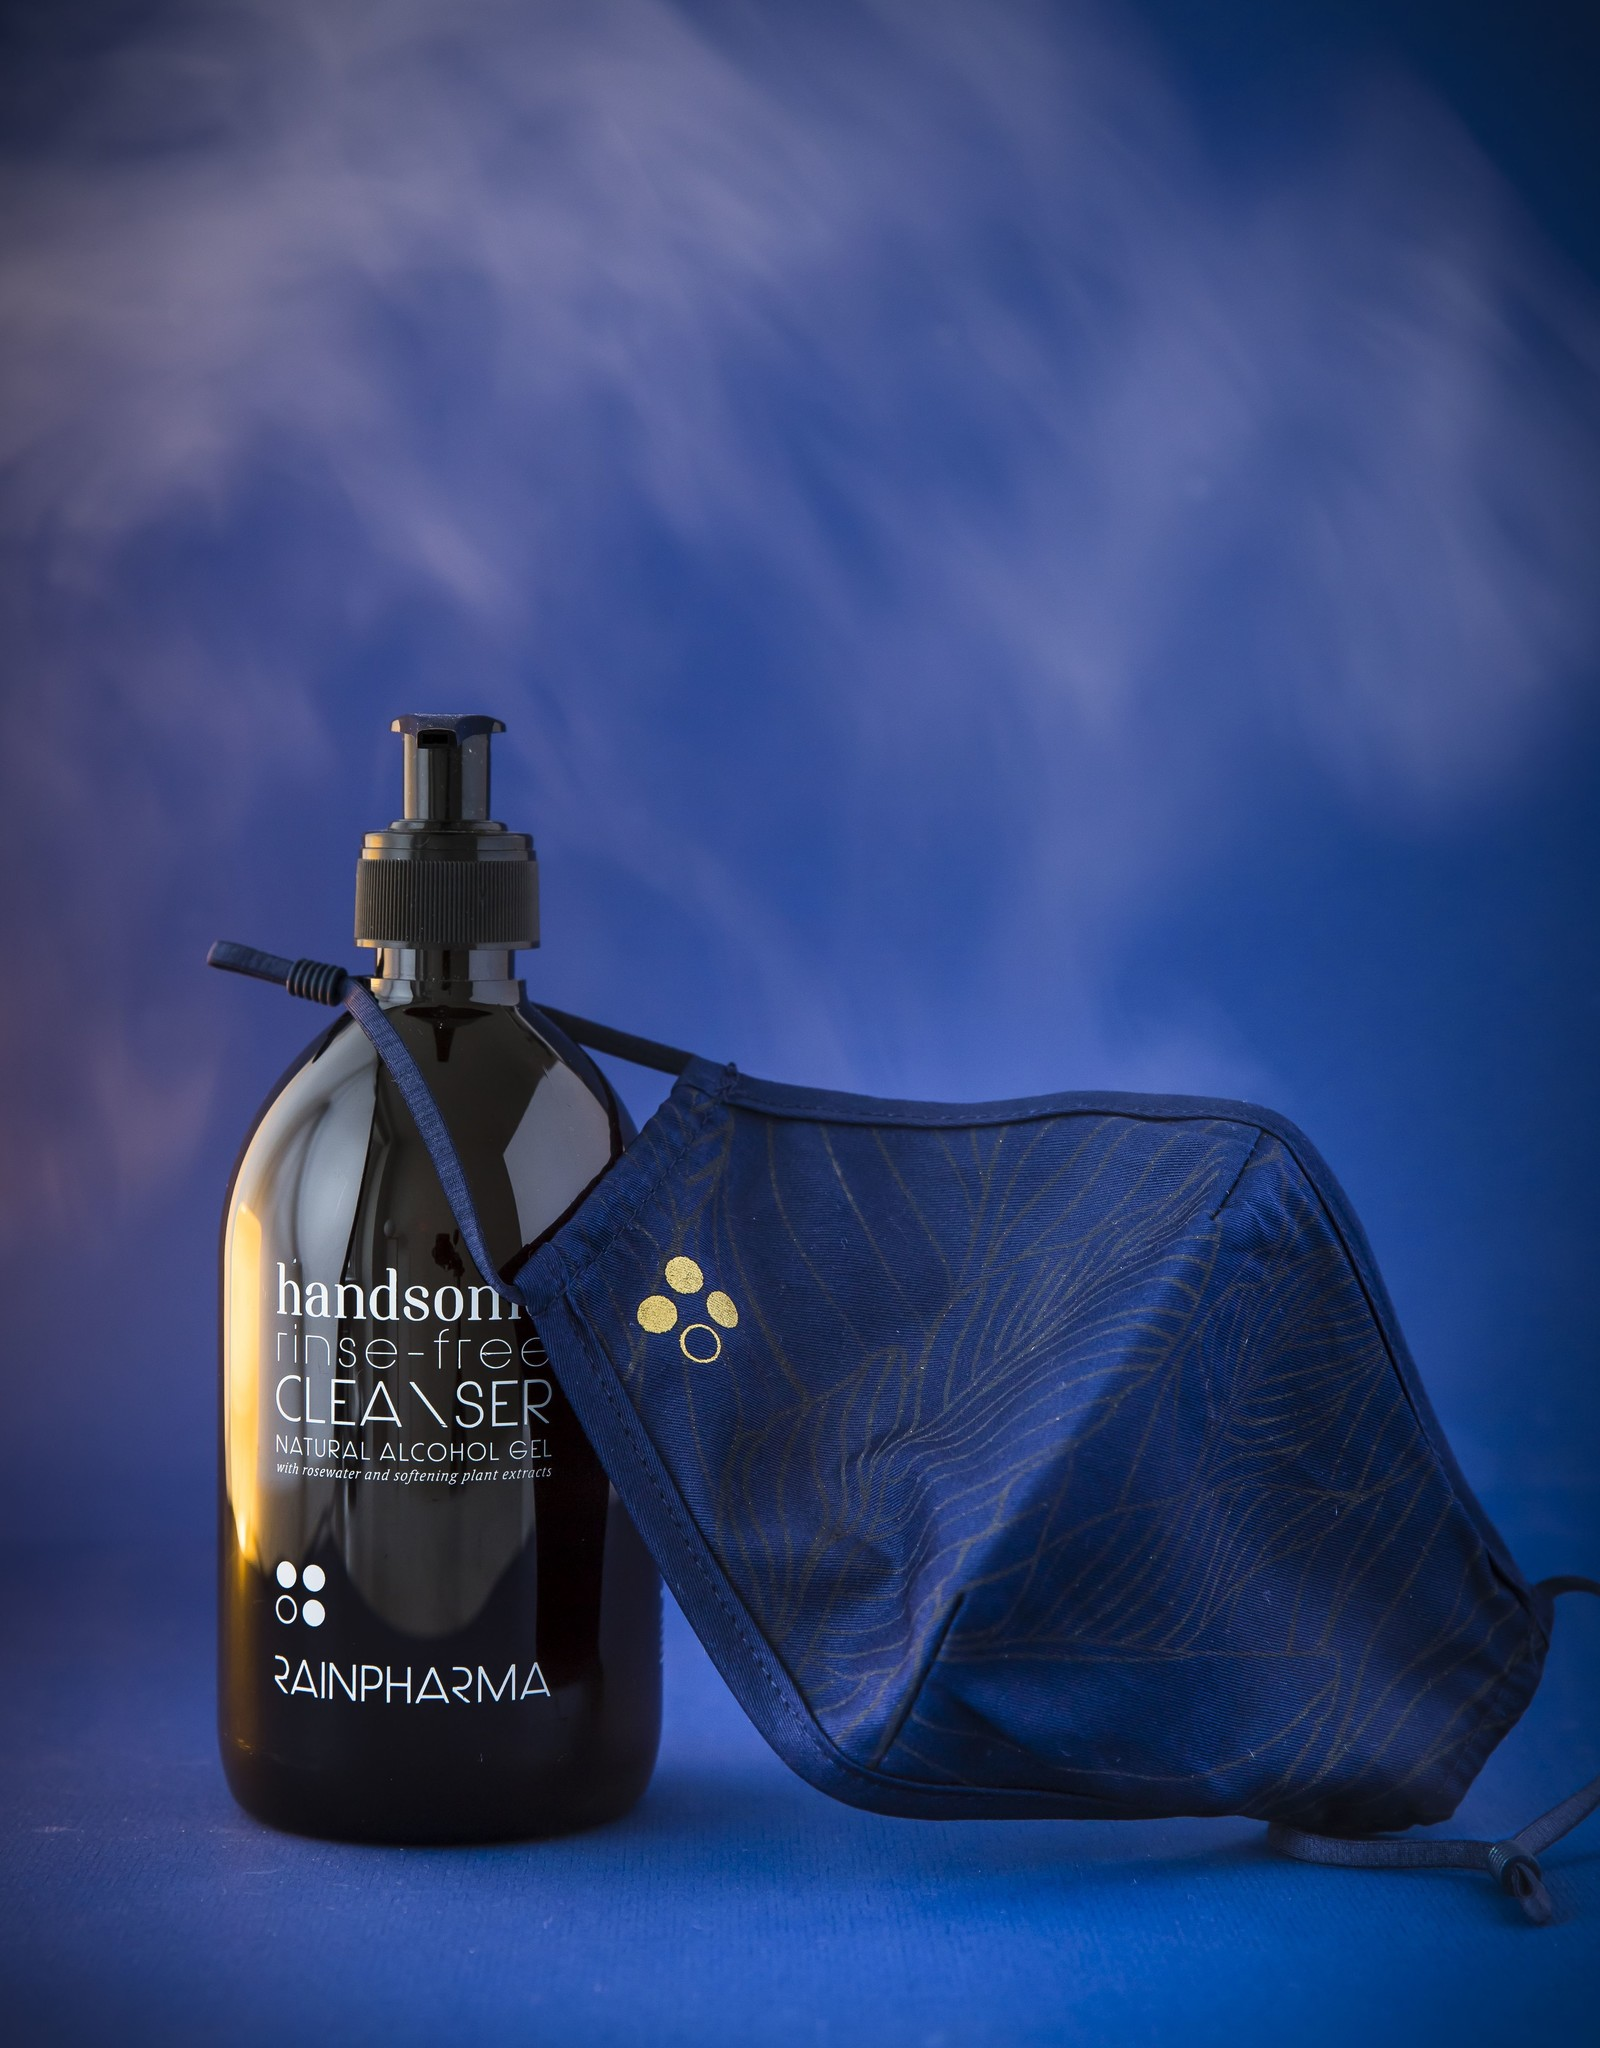 RainPharma Rainpharma - Mondmasker Winter (blauw) - 1 stuk